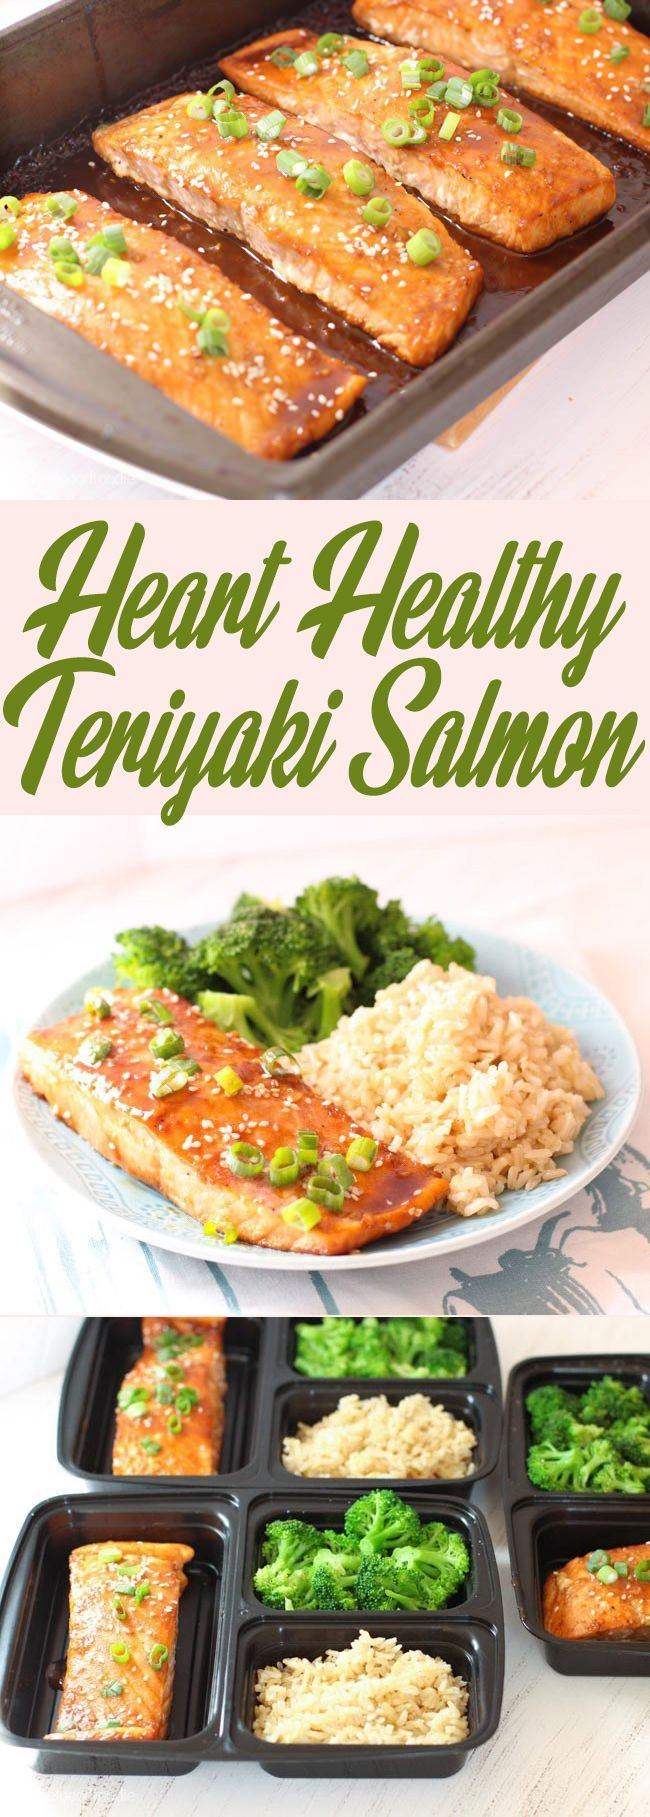 Heart Healthy Teriyaki Salmon